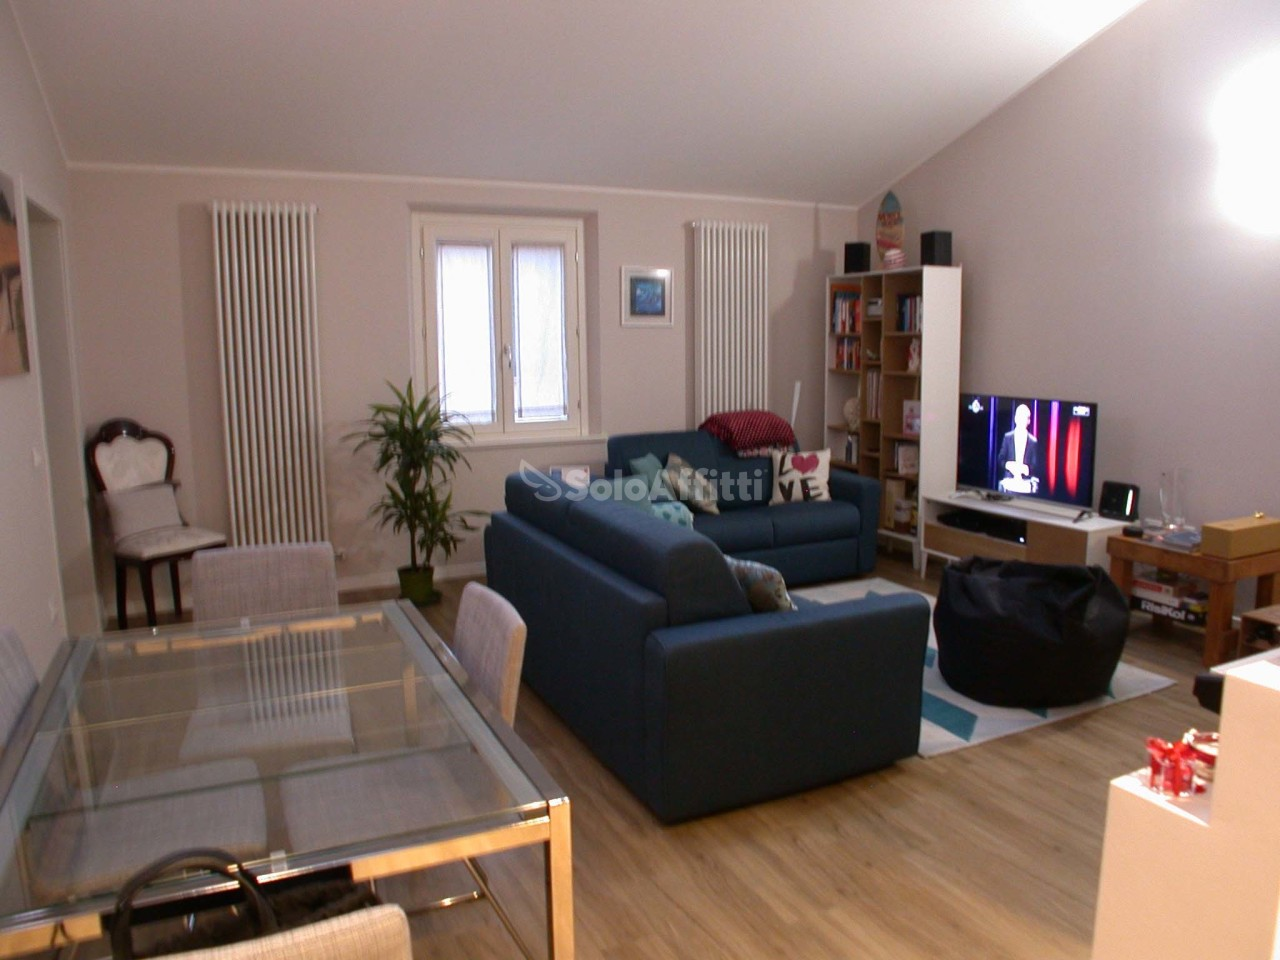 Appartamento, 78 Mq, Affitto - Pesaro (Pesaro Urbino)